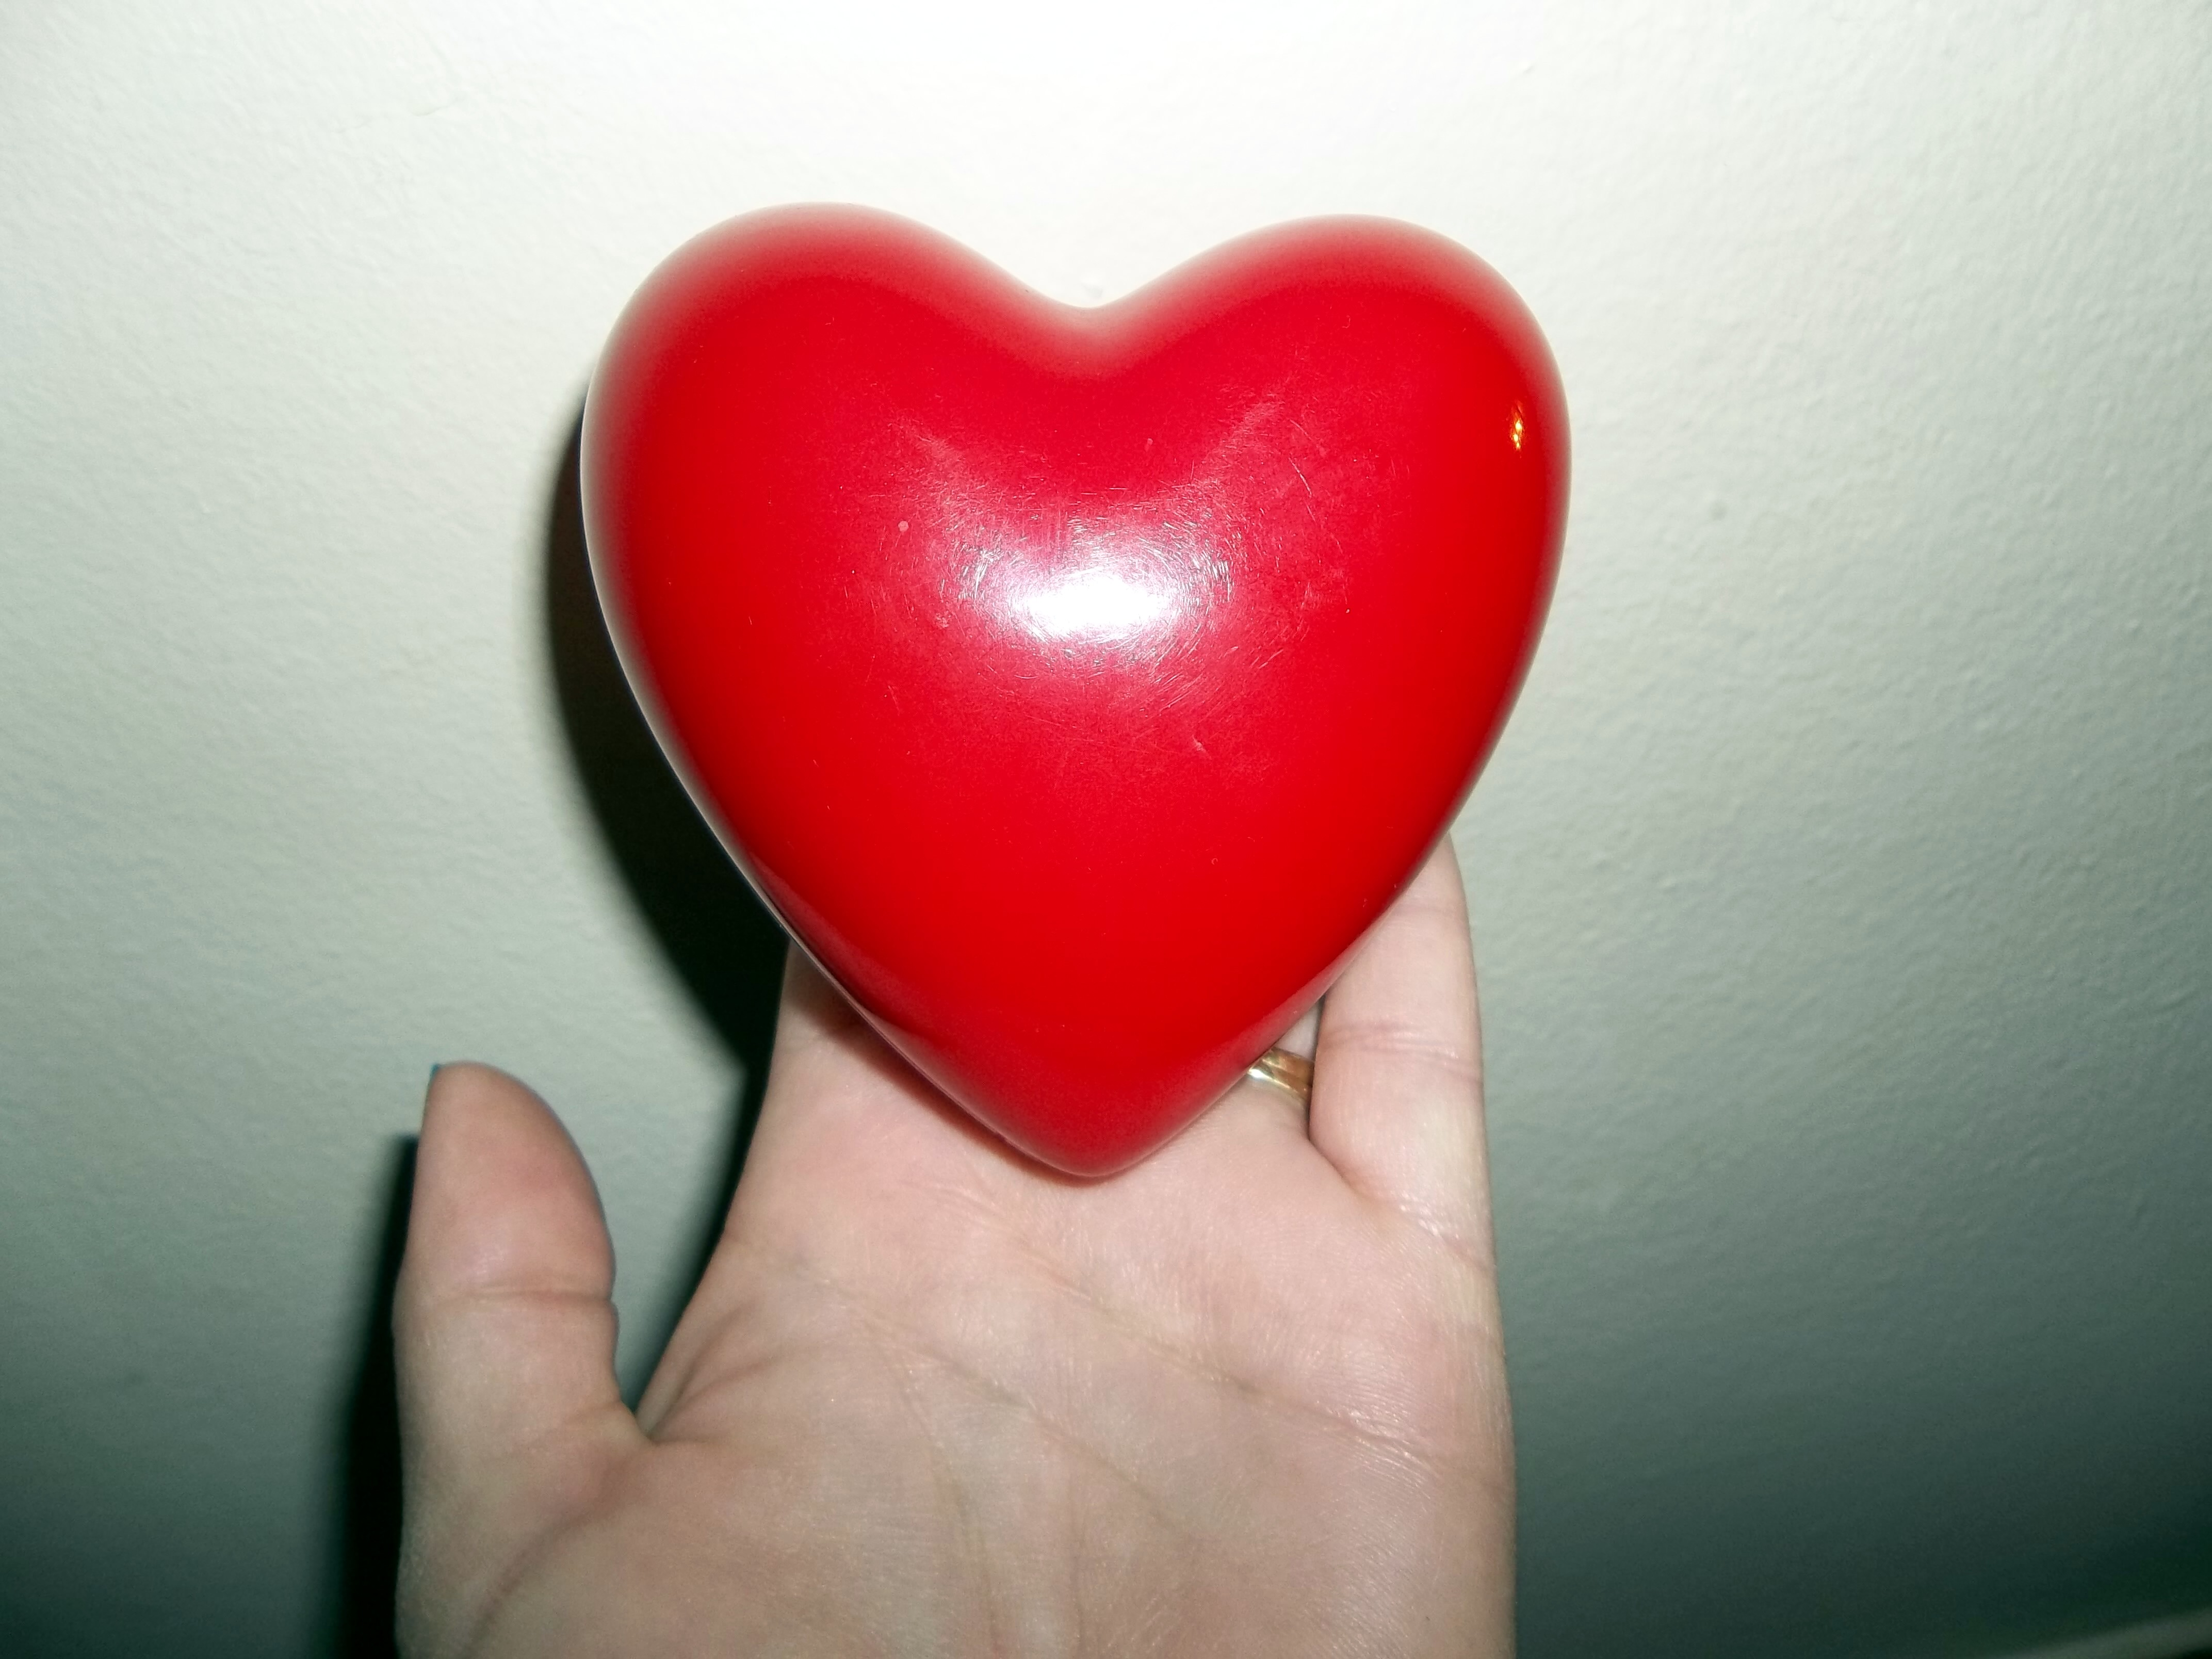 Mi amor dominando la situacion sobre mi en la paz - 3 6